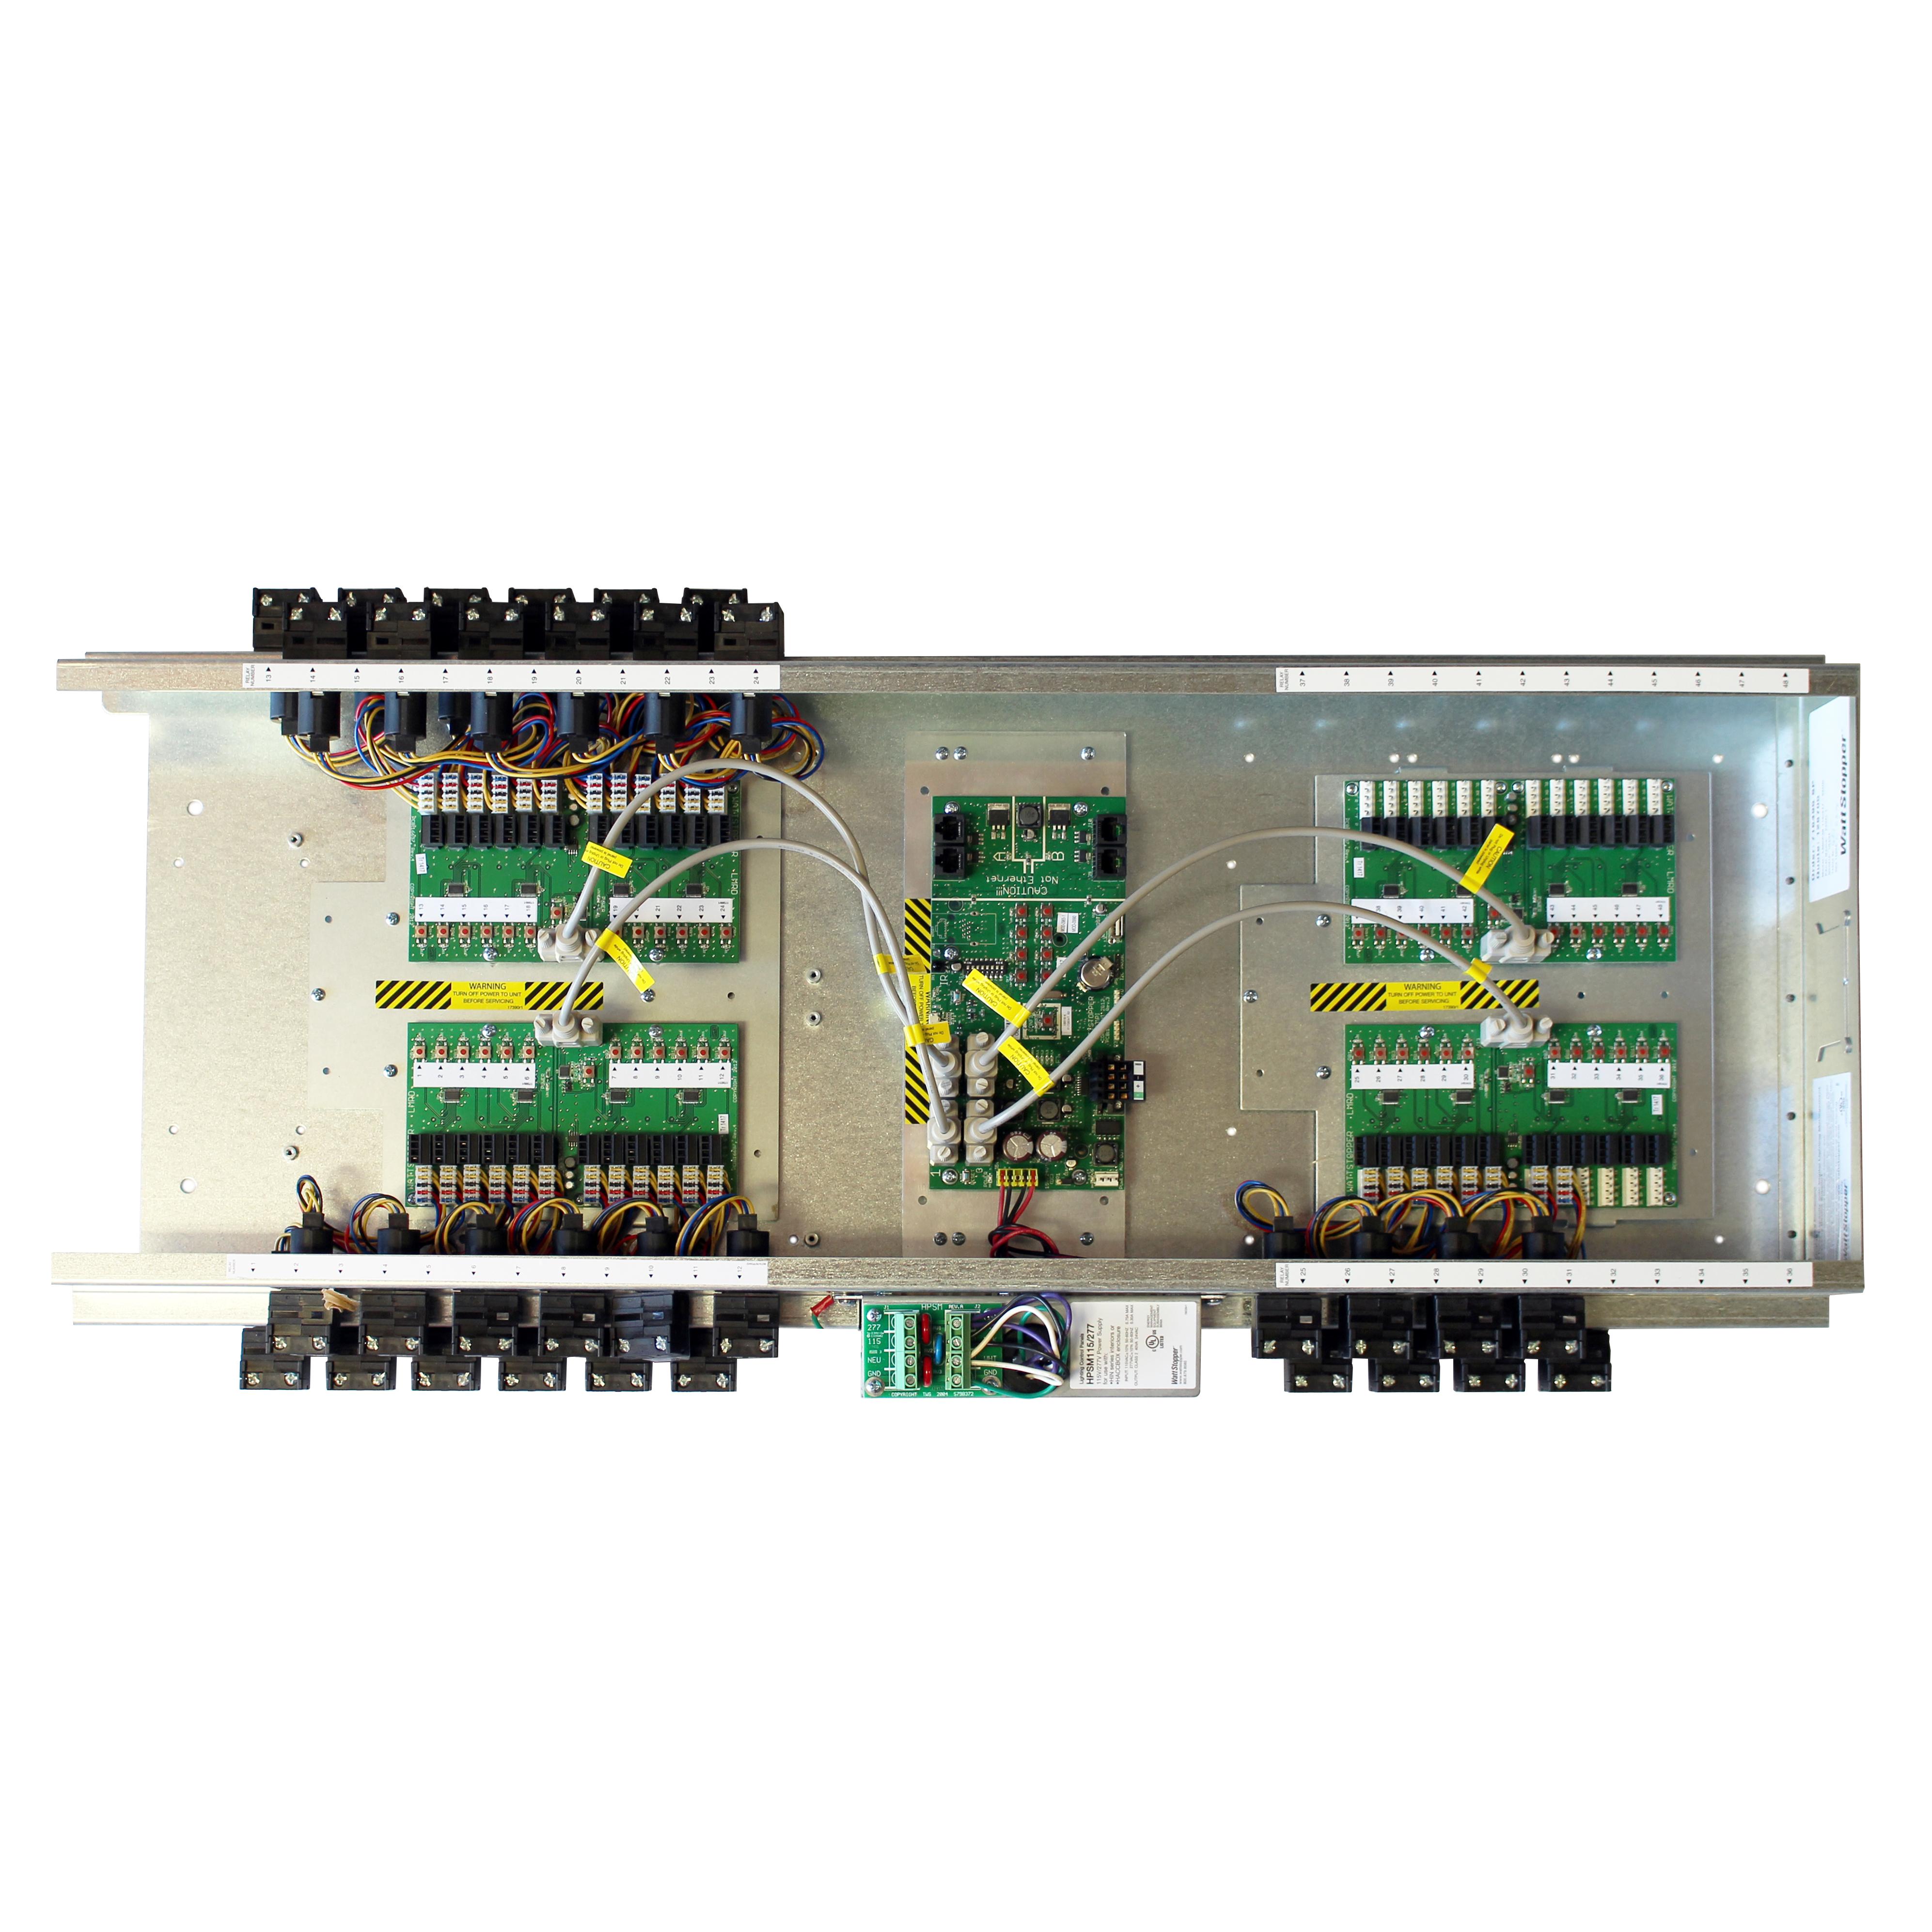 Wattstopper Lmcp48 Lighting Relay Control Panel Interior 48 Dlm 120v